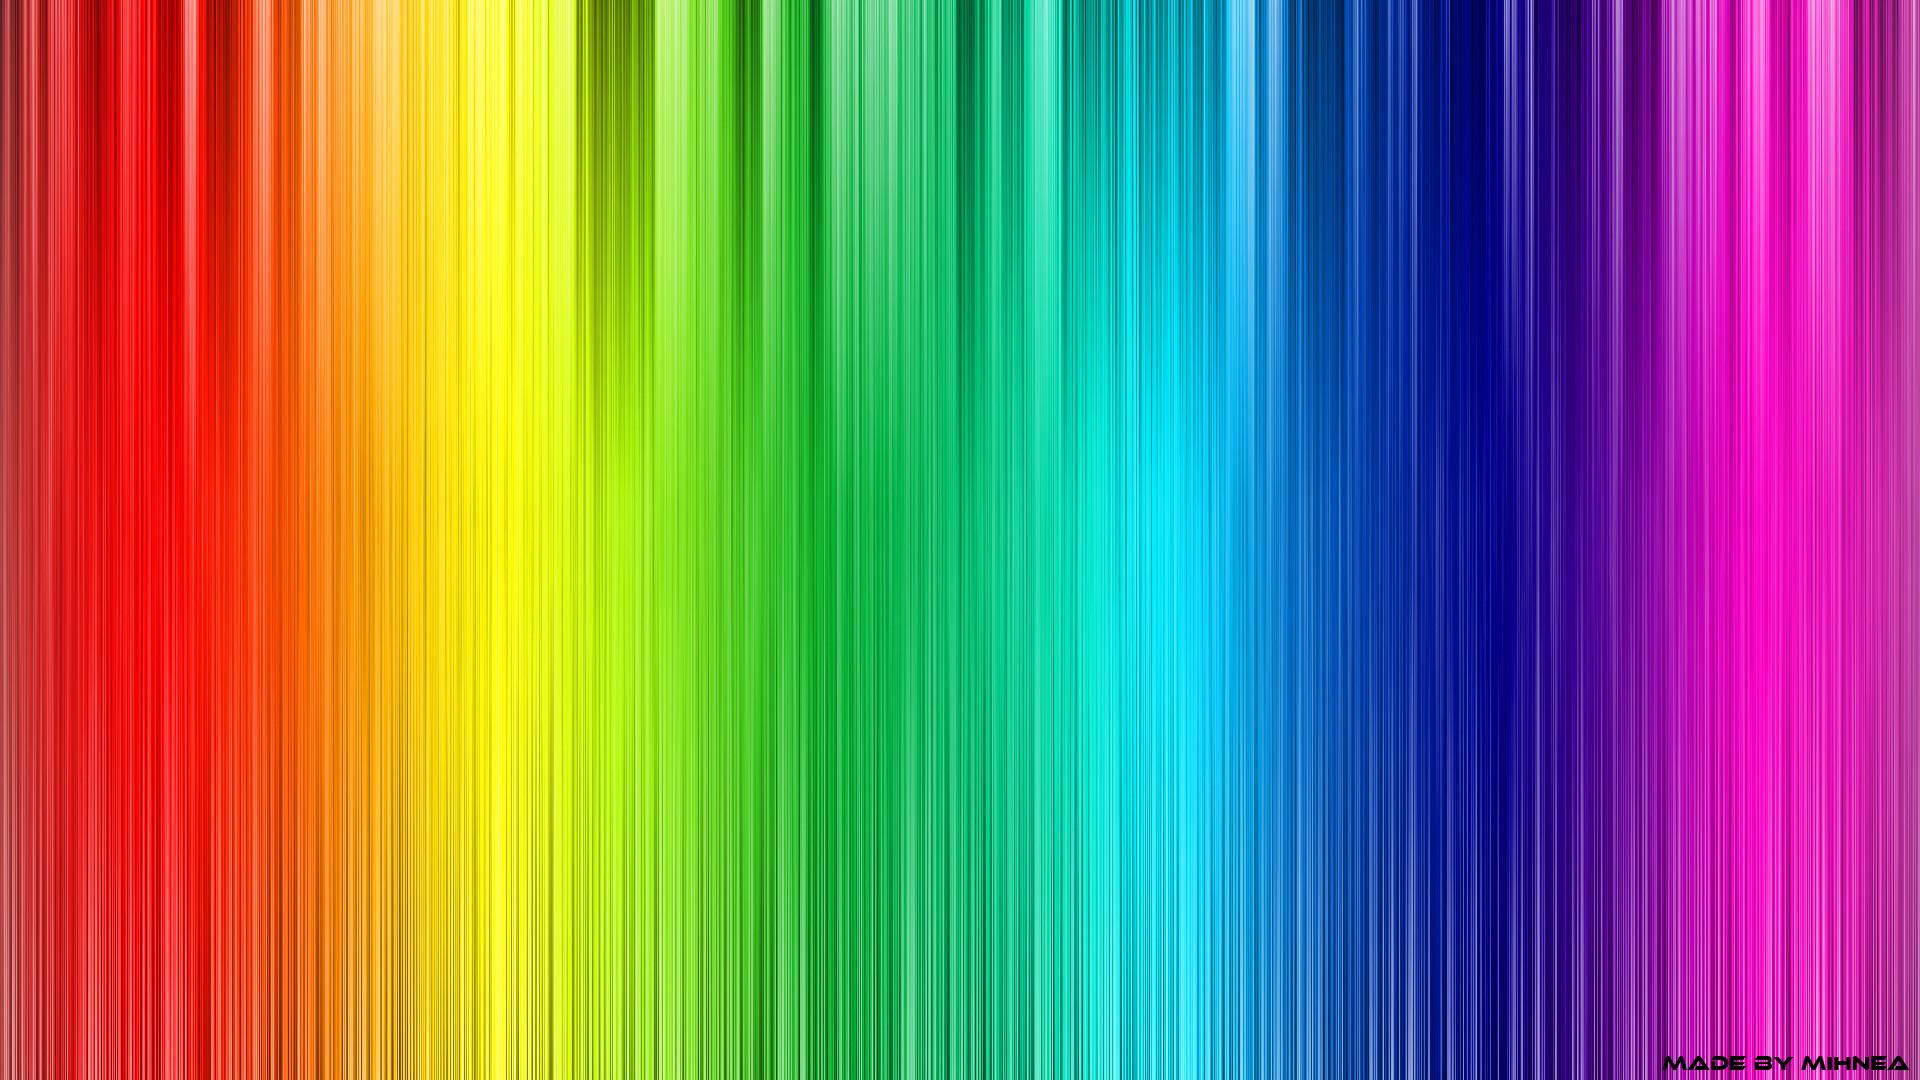 Cool Multicolor Wallpaper 31813 2560×1600 px